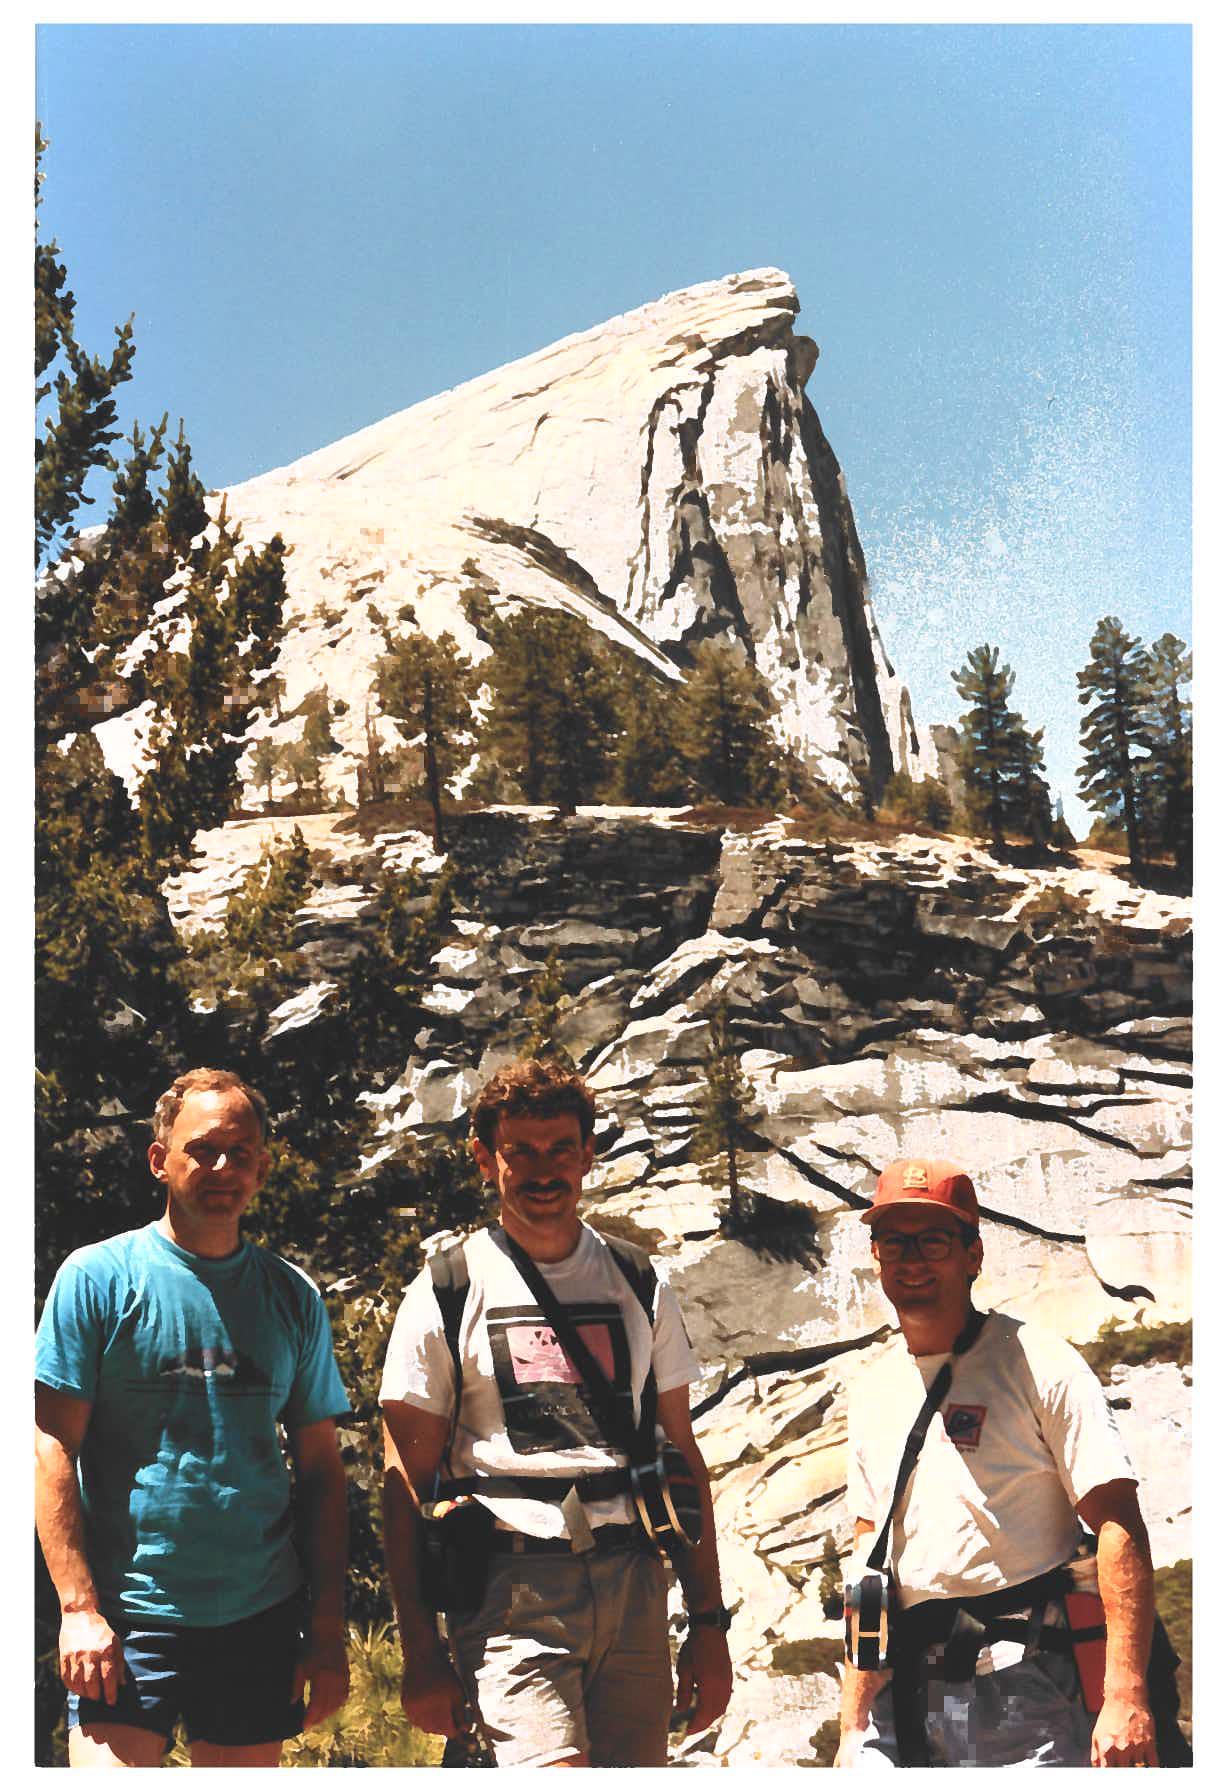 Edward Larsen, William Martin, and Clint Ballinger in Yosemite National Park.